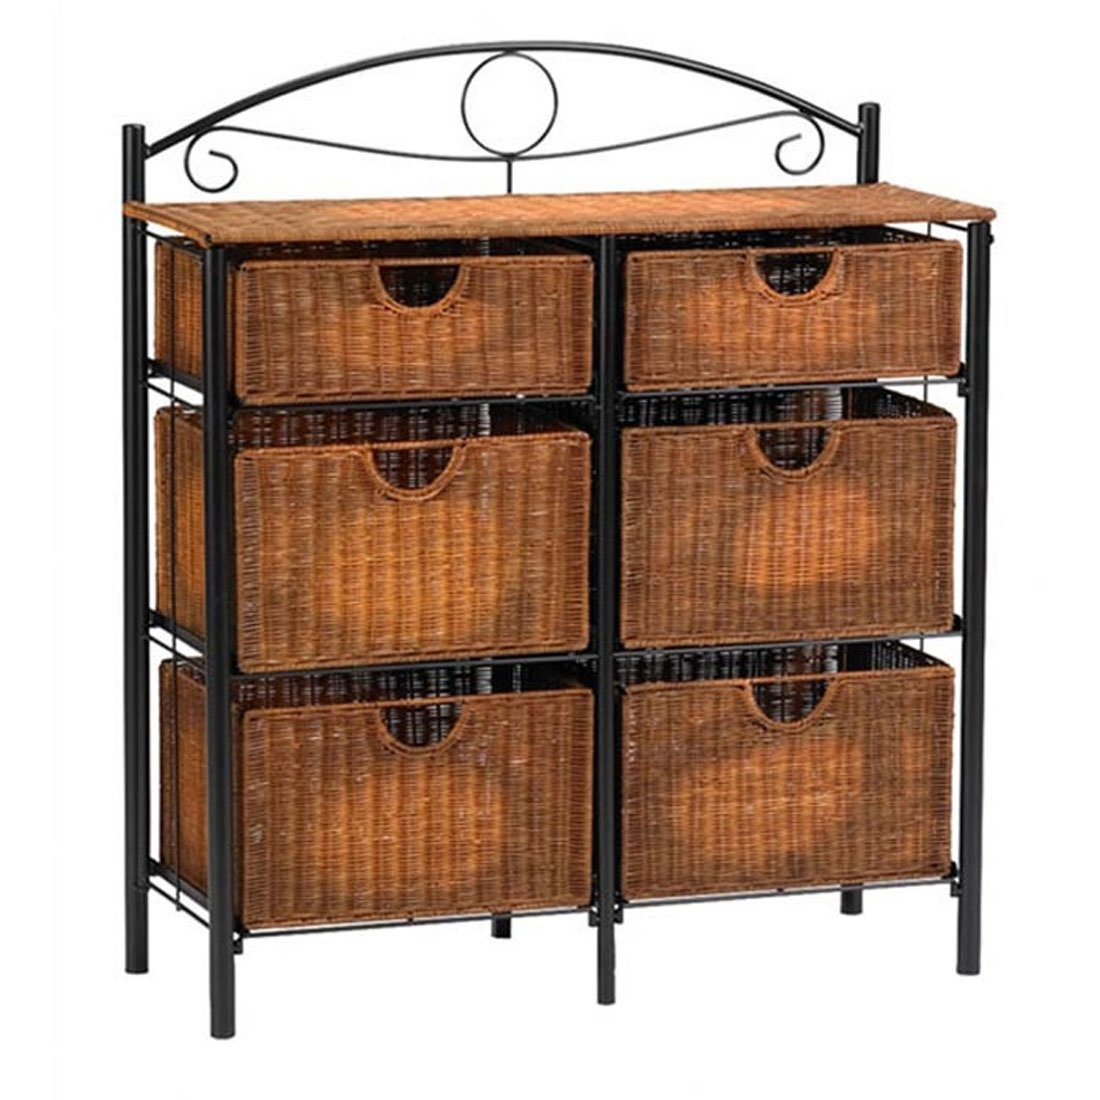 Amazon Com 6 Drawer Storage Chests Organizer Woven Wicker Baskets